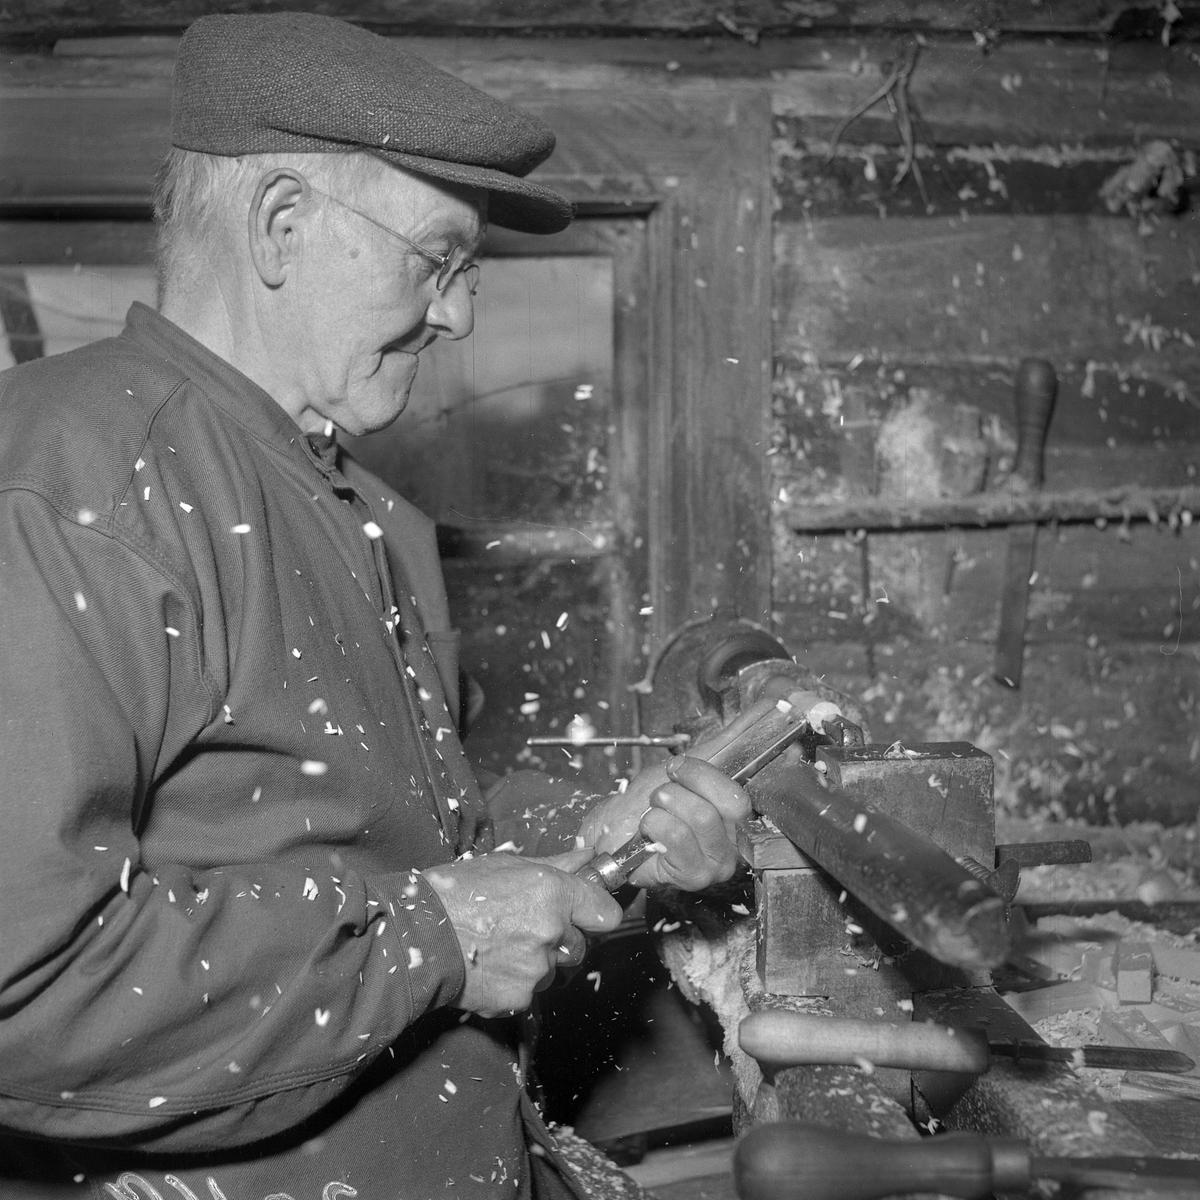 Johan Nilsson svarvar en knyppelpinne.